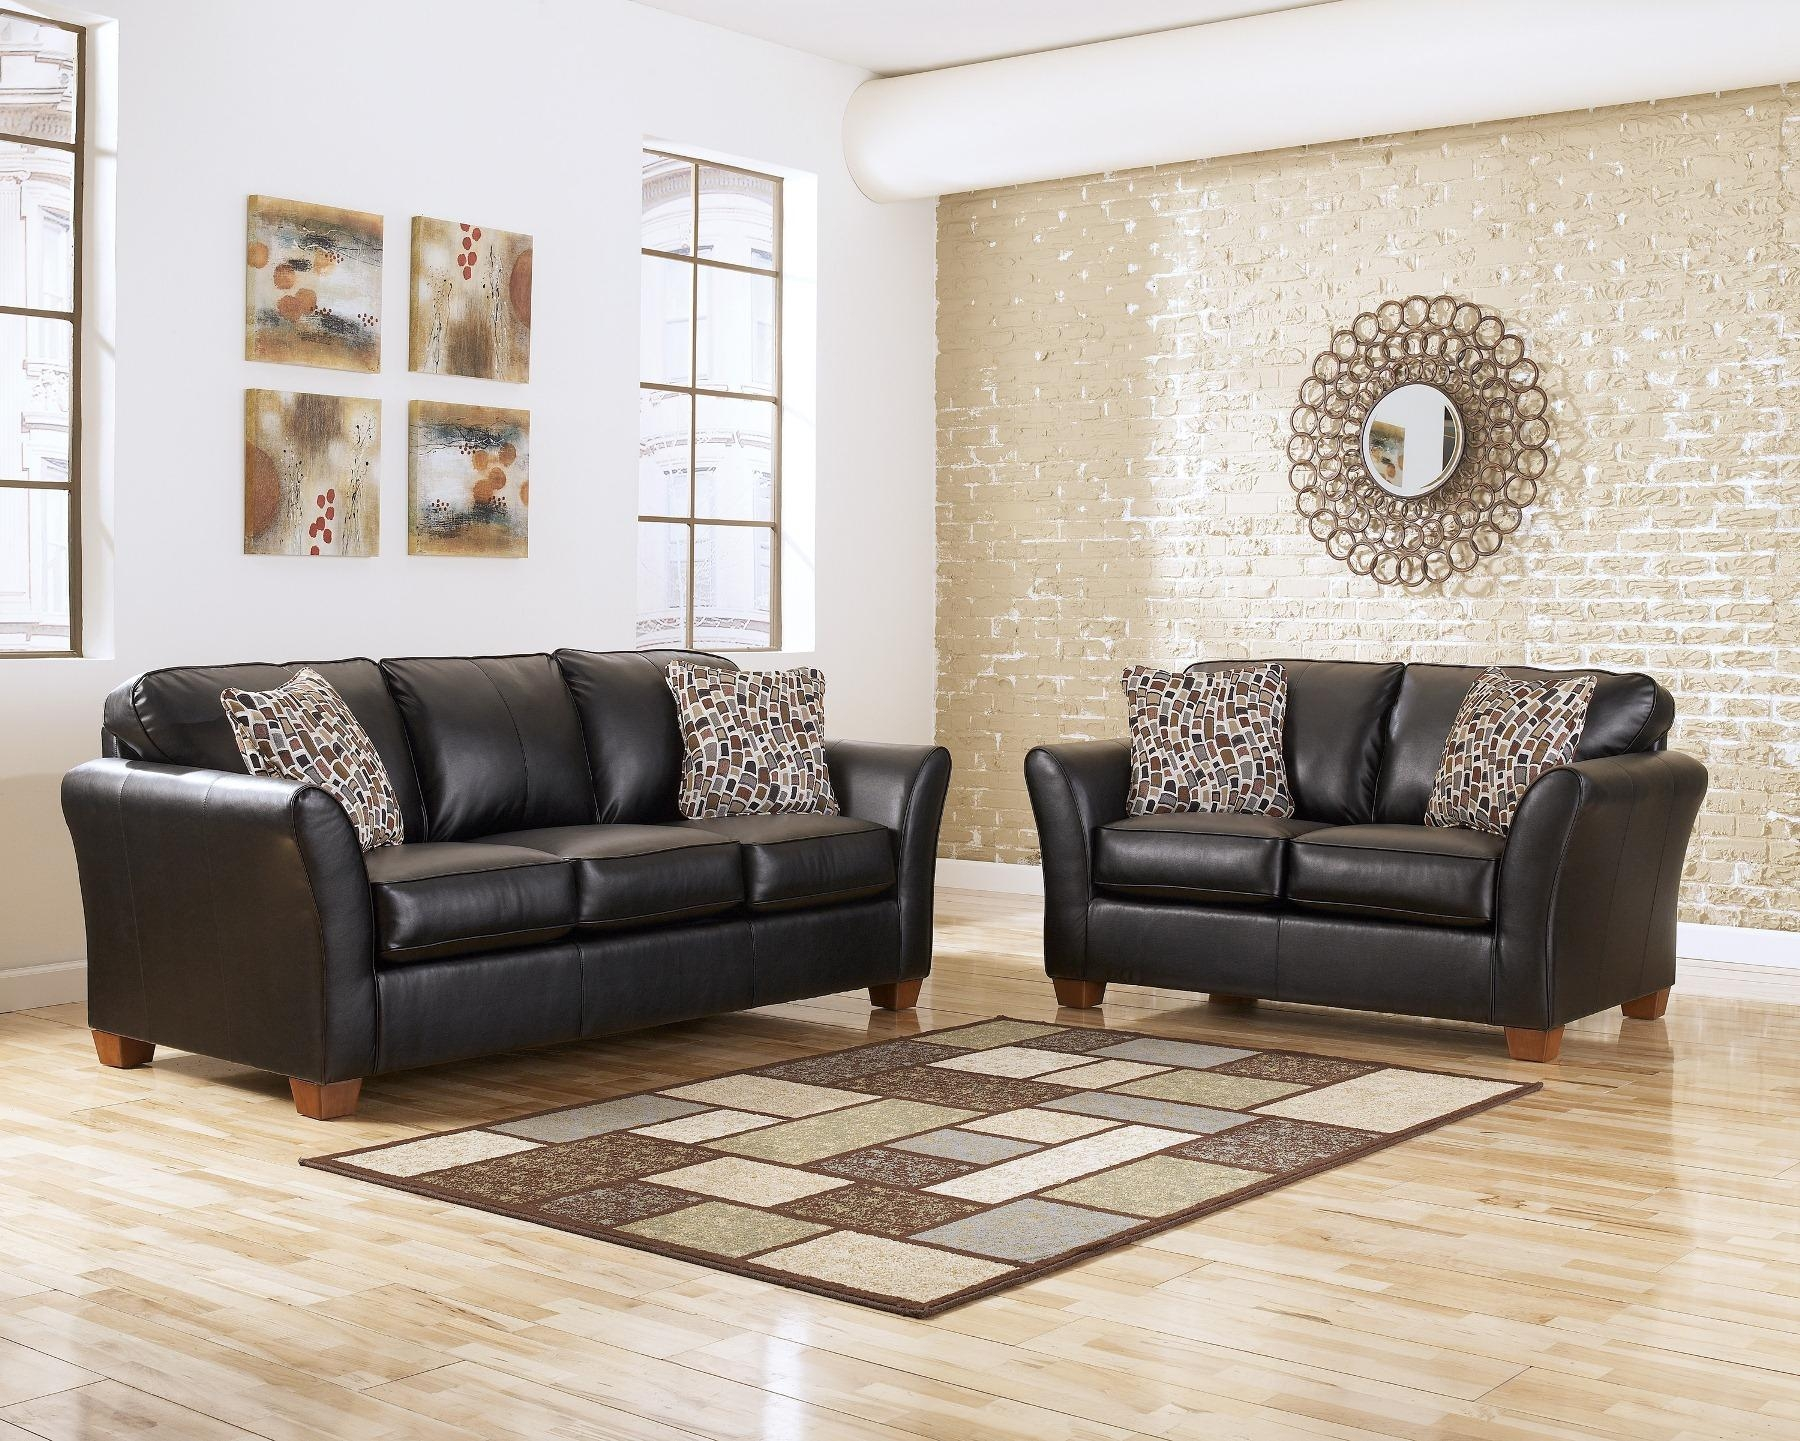 Ingenious Idea Bigs Lots Furniture Unique Design Big Lots Sofa Intended For Big Lots Sofa Sleeper (Image 5 of 20)